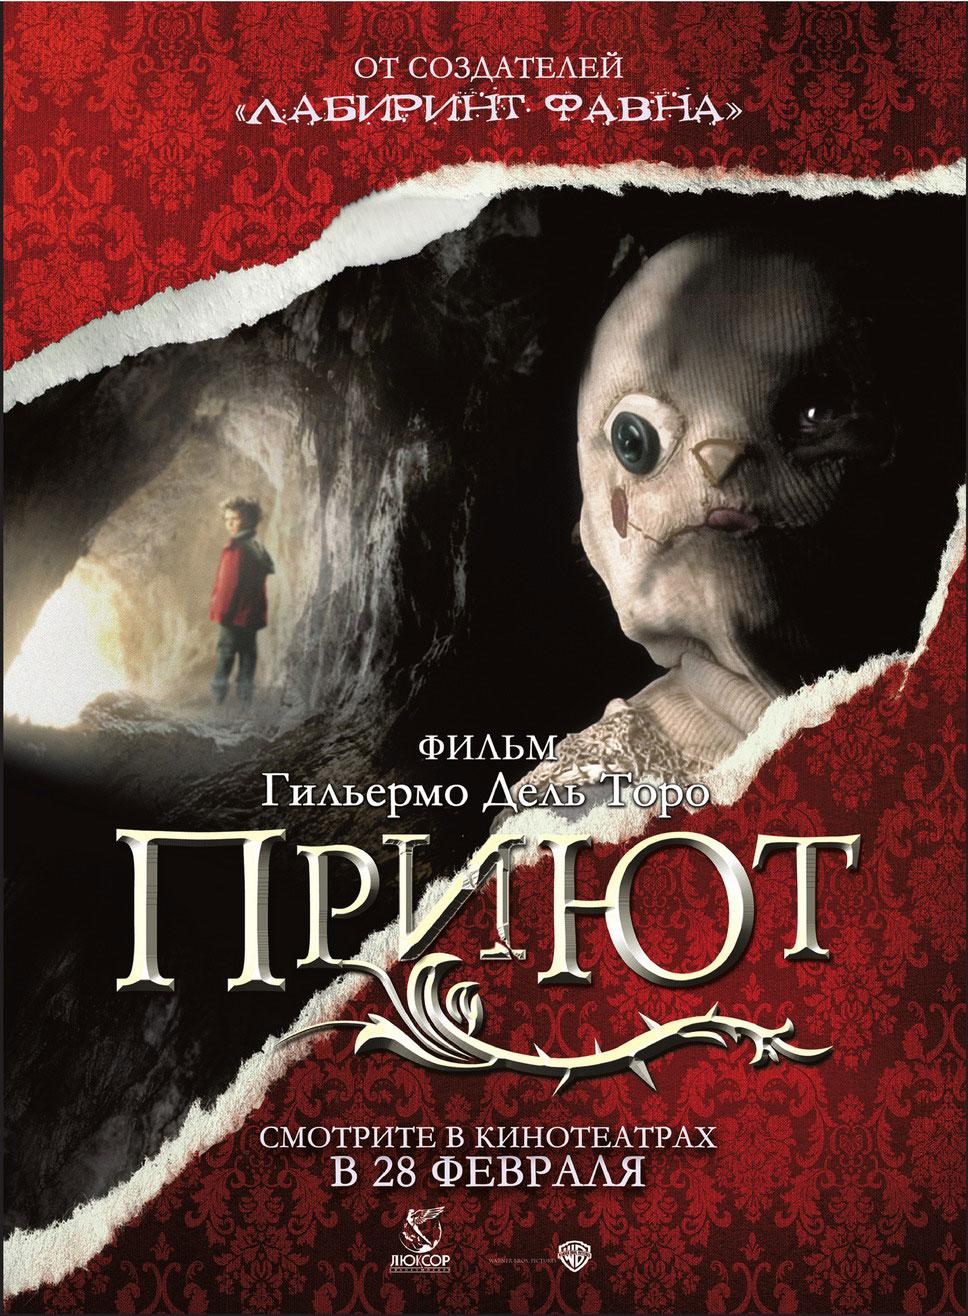 http://st.kinopoisk.ru/im/poster/6/9/6/kinopoisk.ru-El-orfanato-696694.jpg